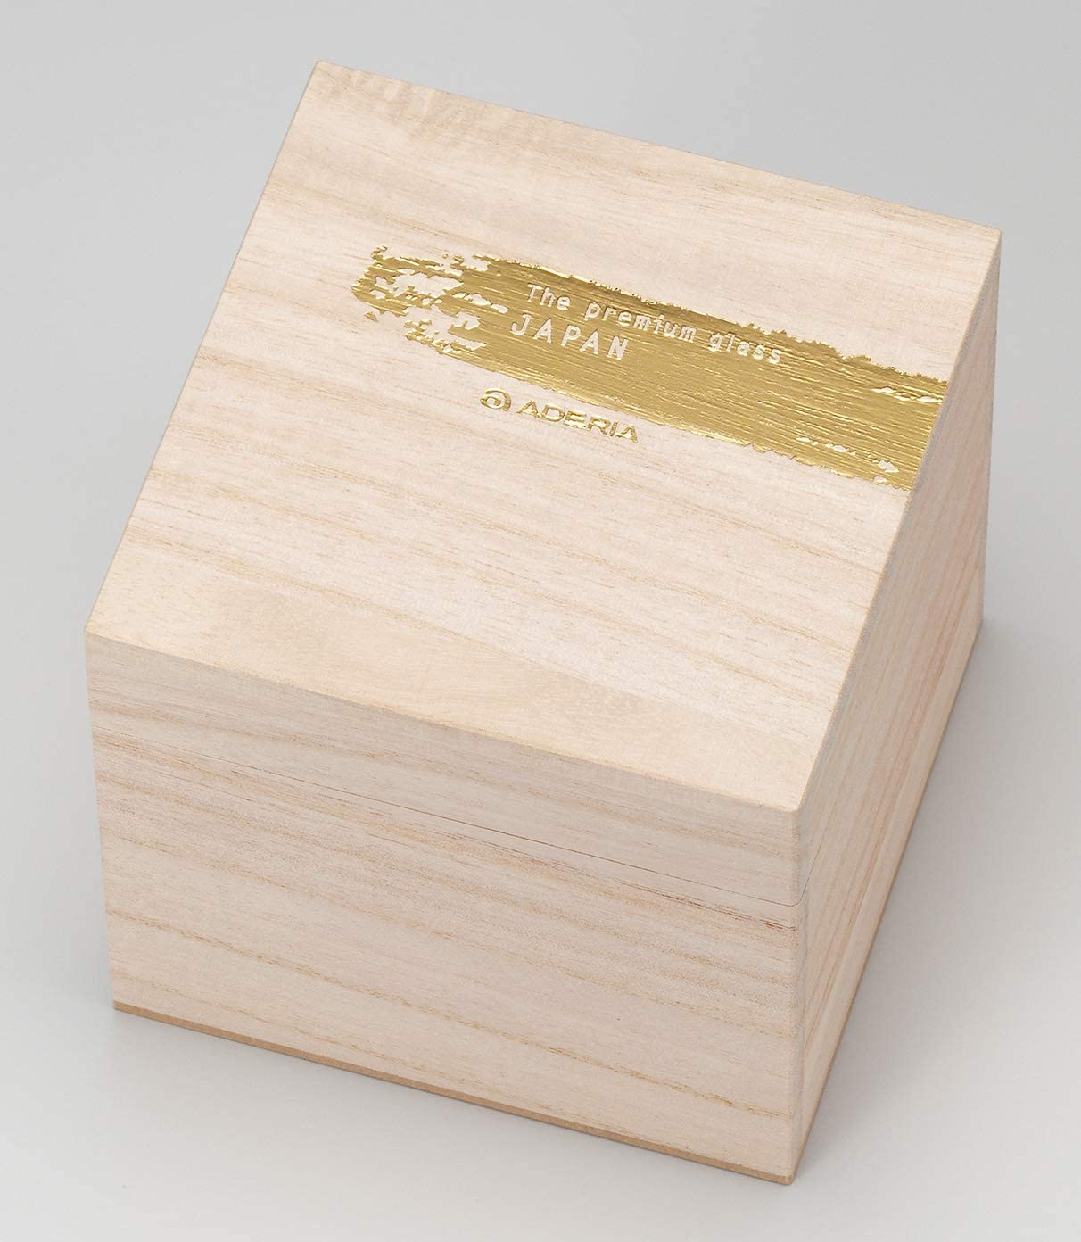 THE PREMIUM NIPPON TASTE(プレミアムニッポンテイスト) 金一文字 ロックグラス 約335ml 6699の商品画像5